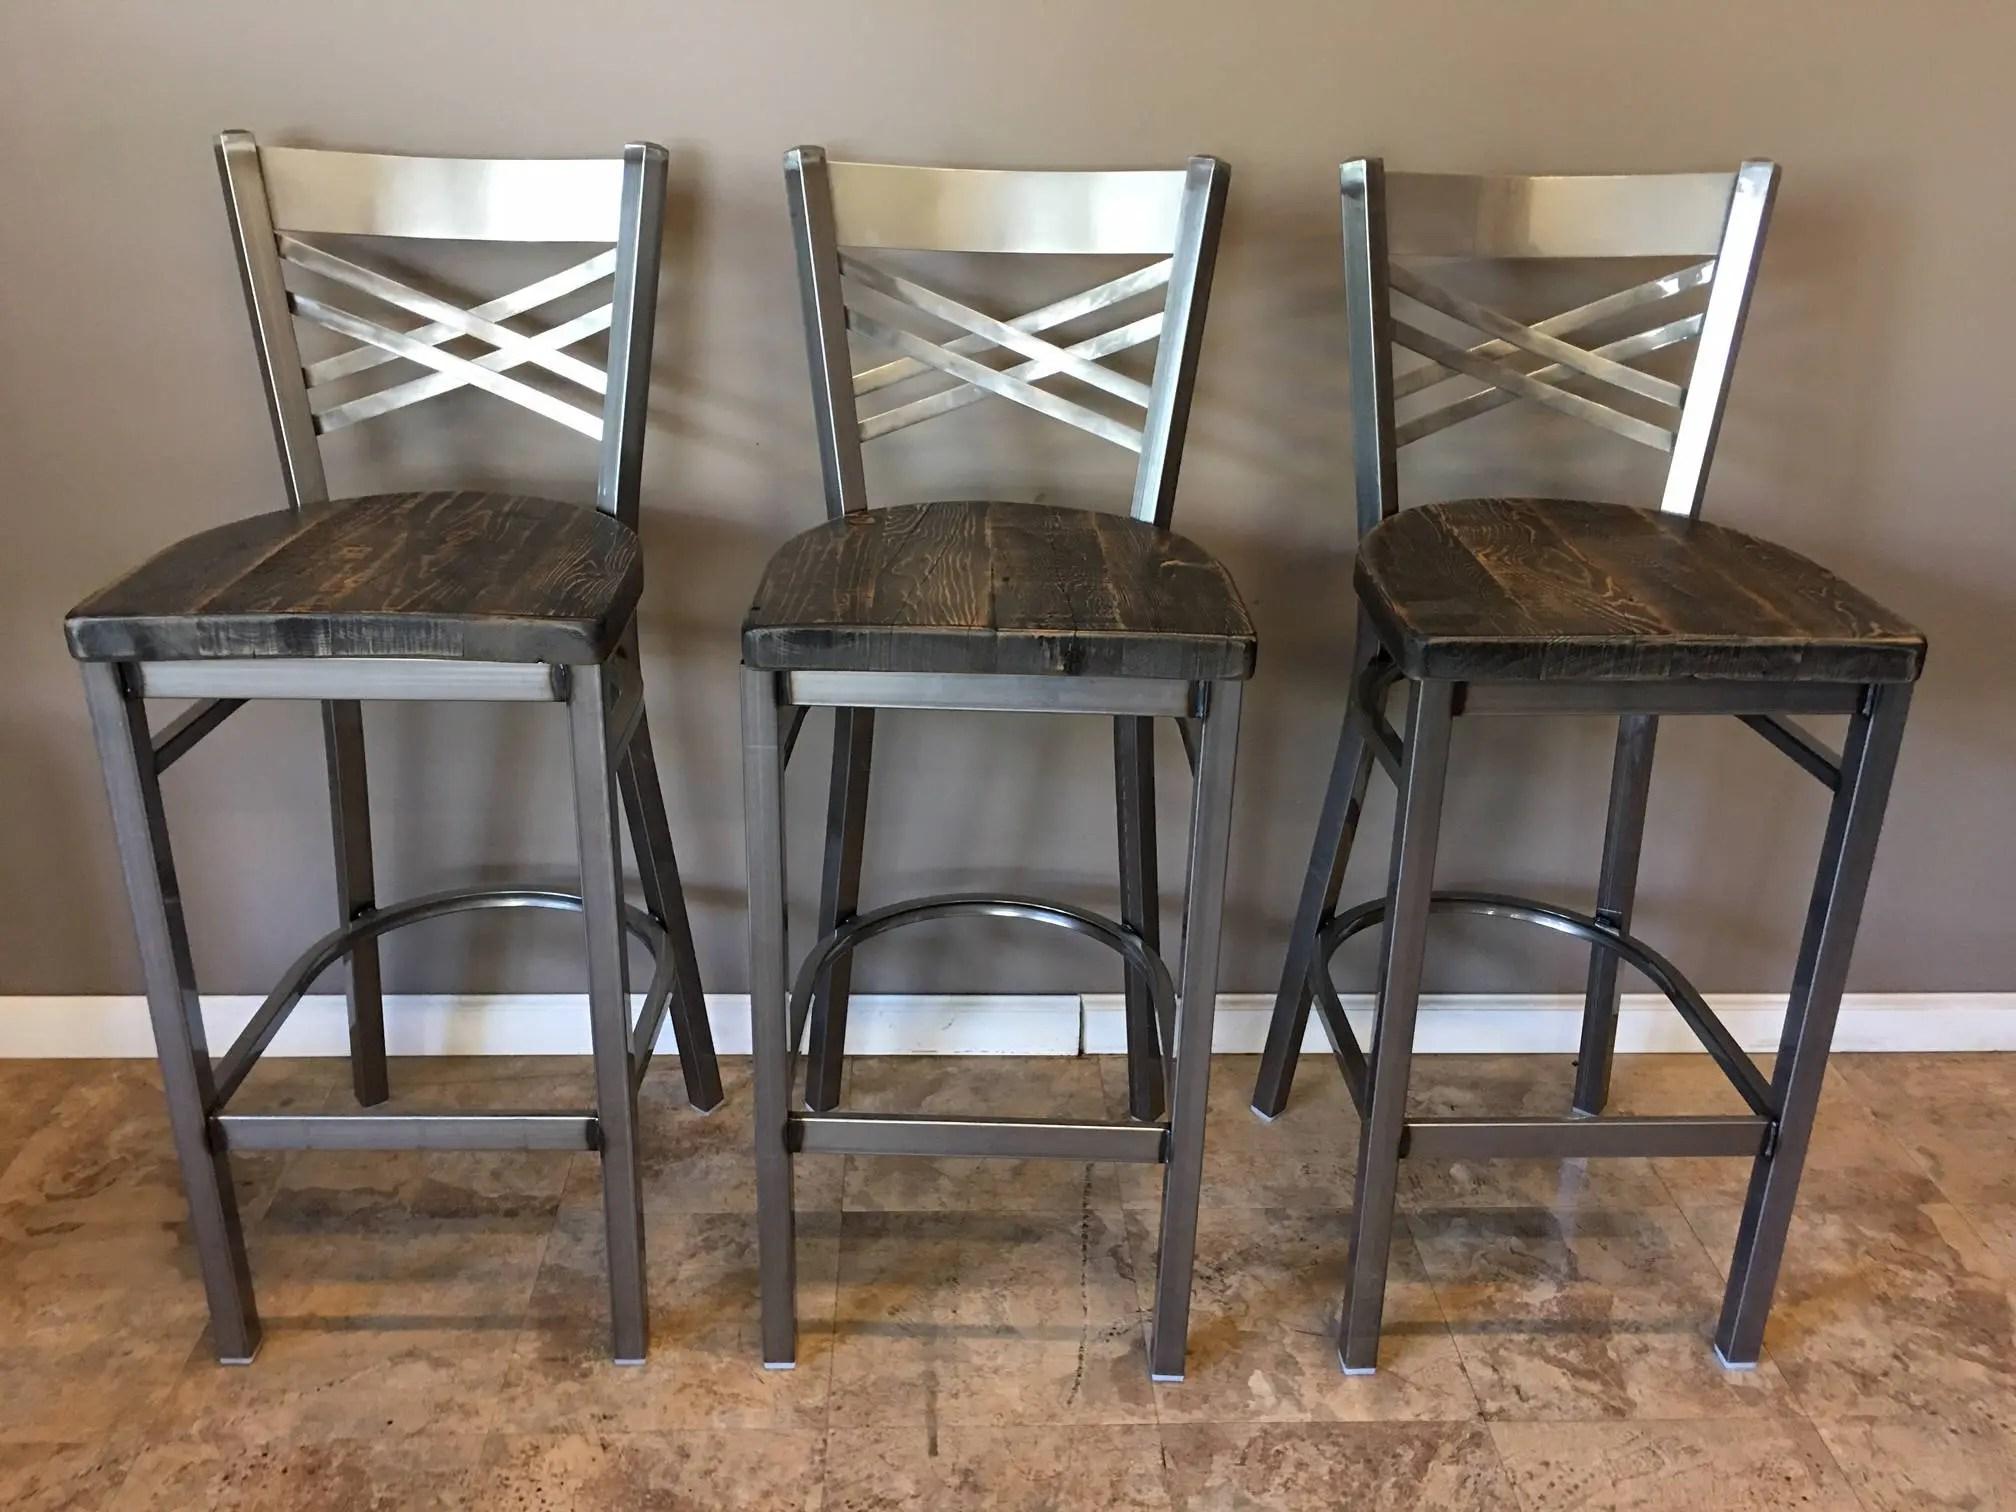 high bar stool chairs sunbrella lounge chair cushions reclaimed set of 3 in gun metal gray finish etsy 50